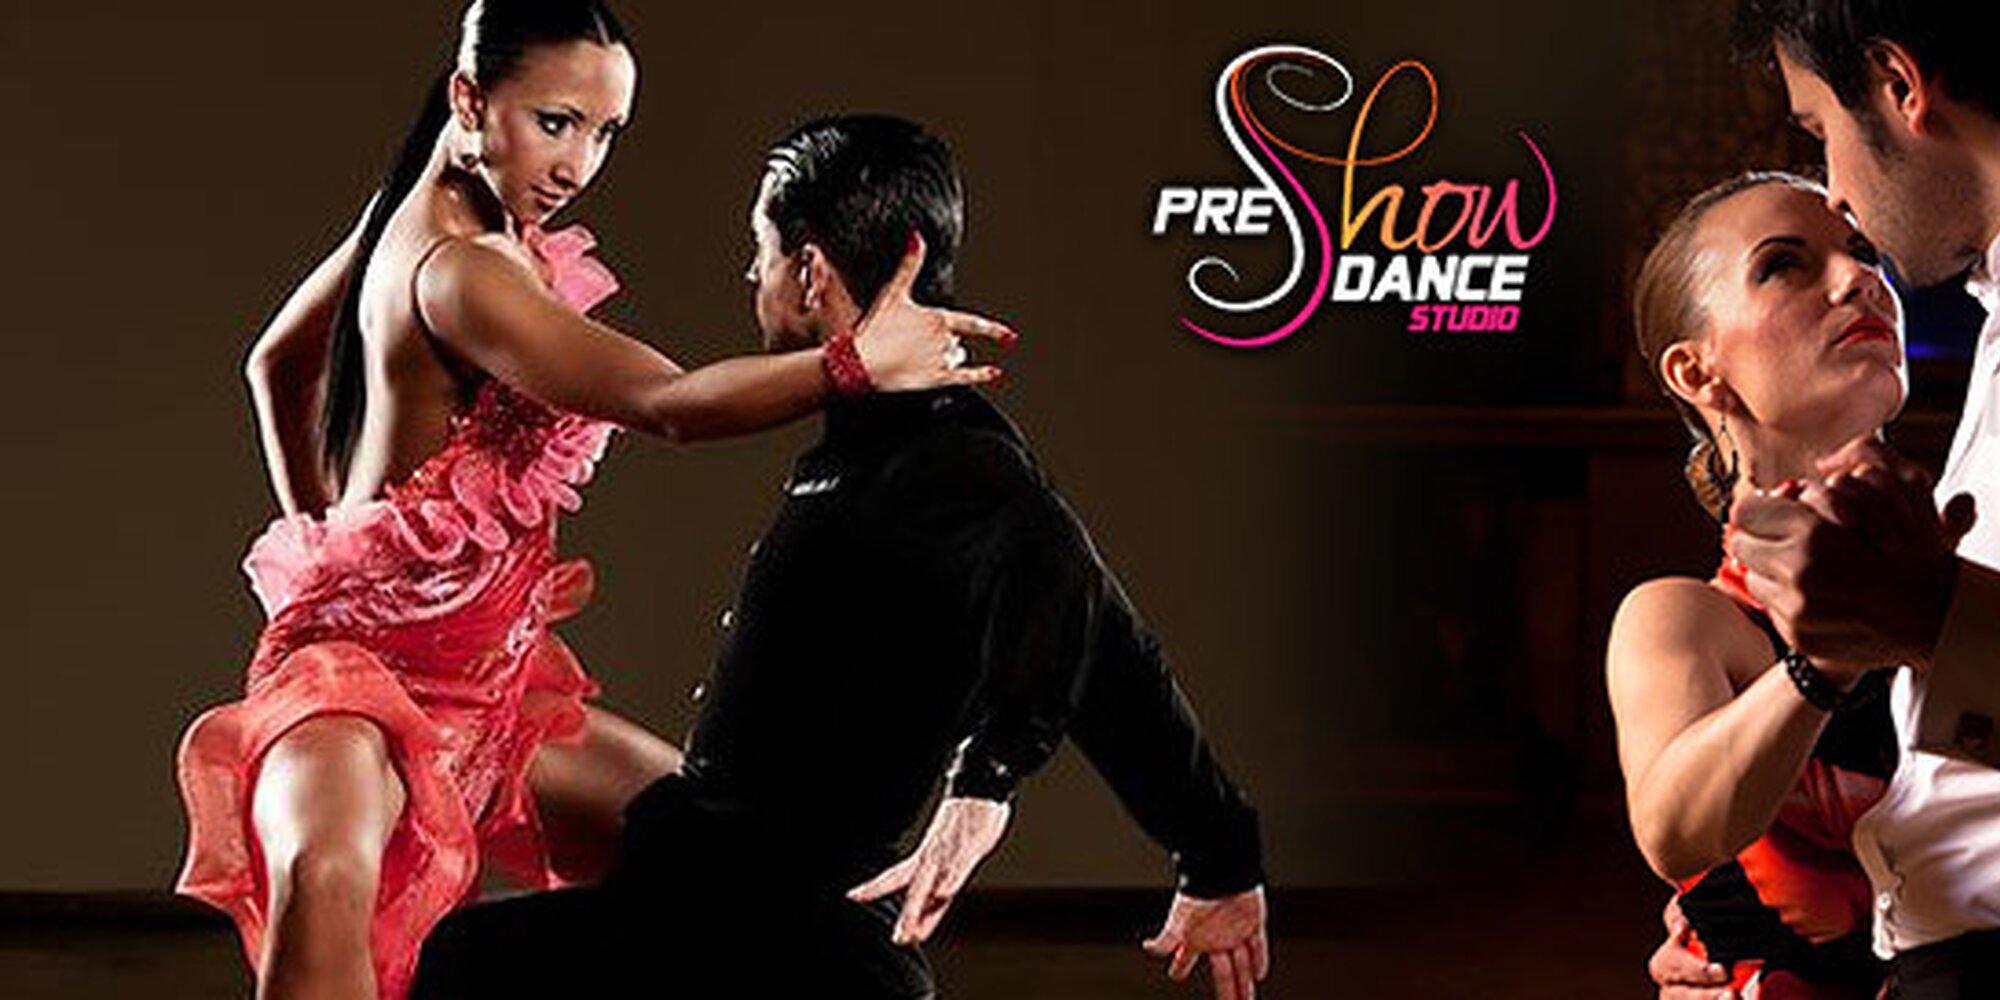 latin dance videos - 1000×563